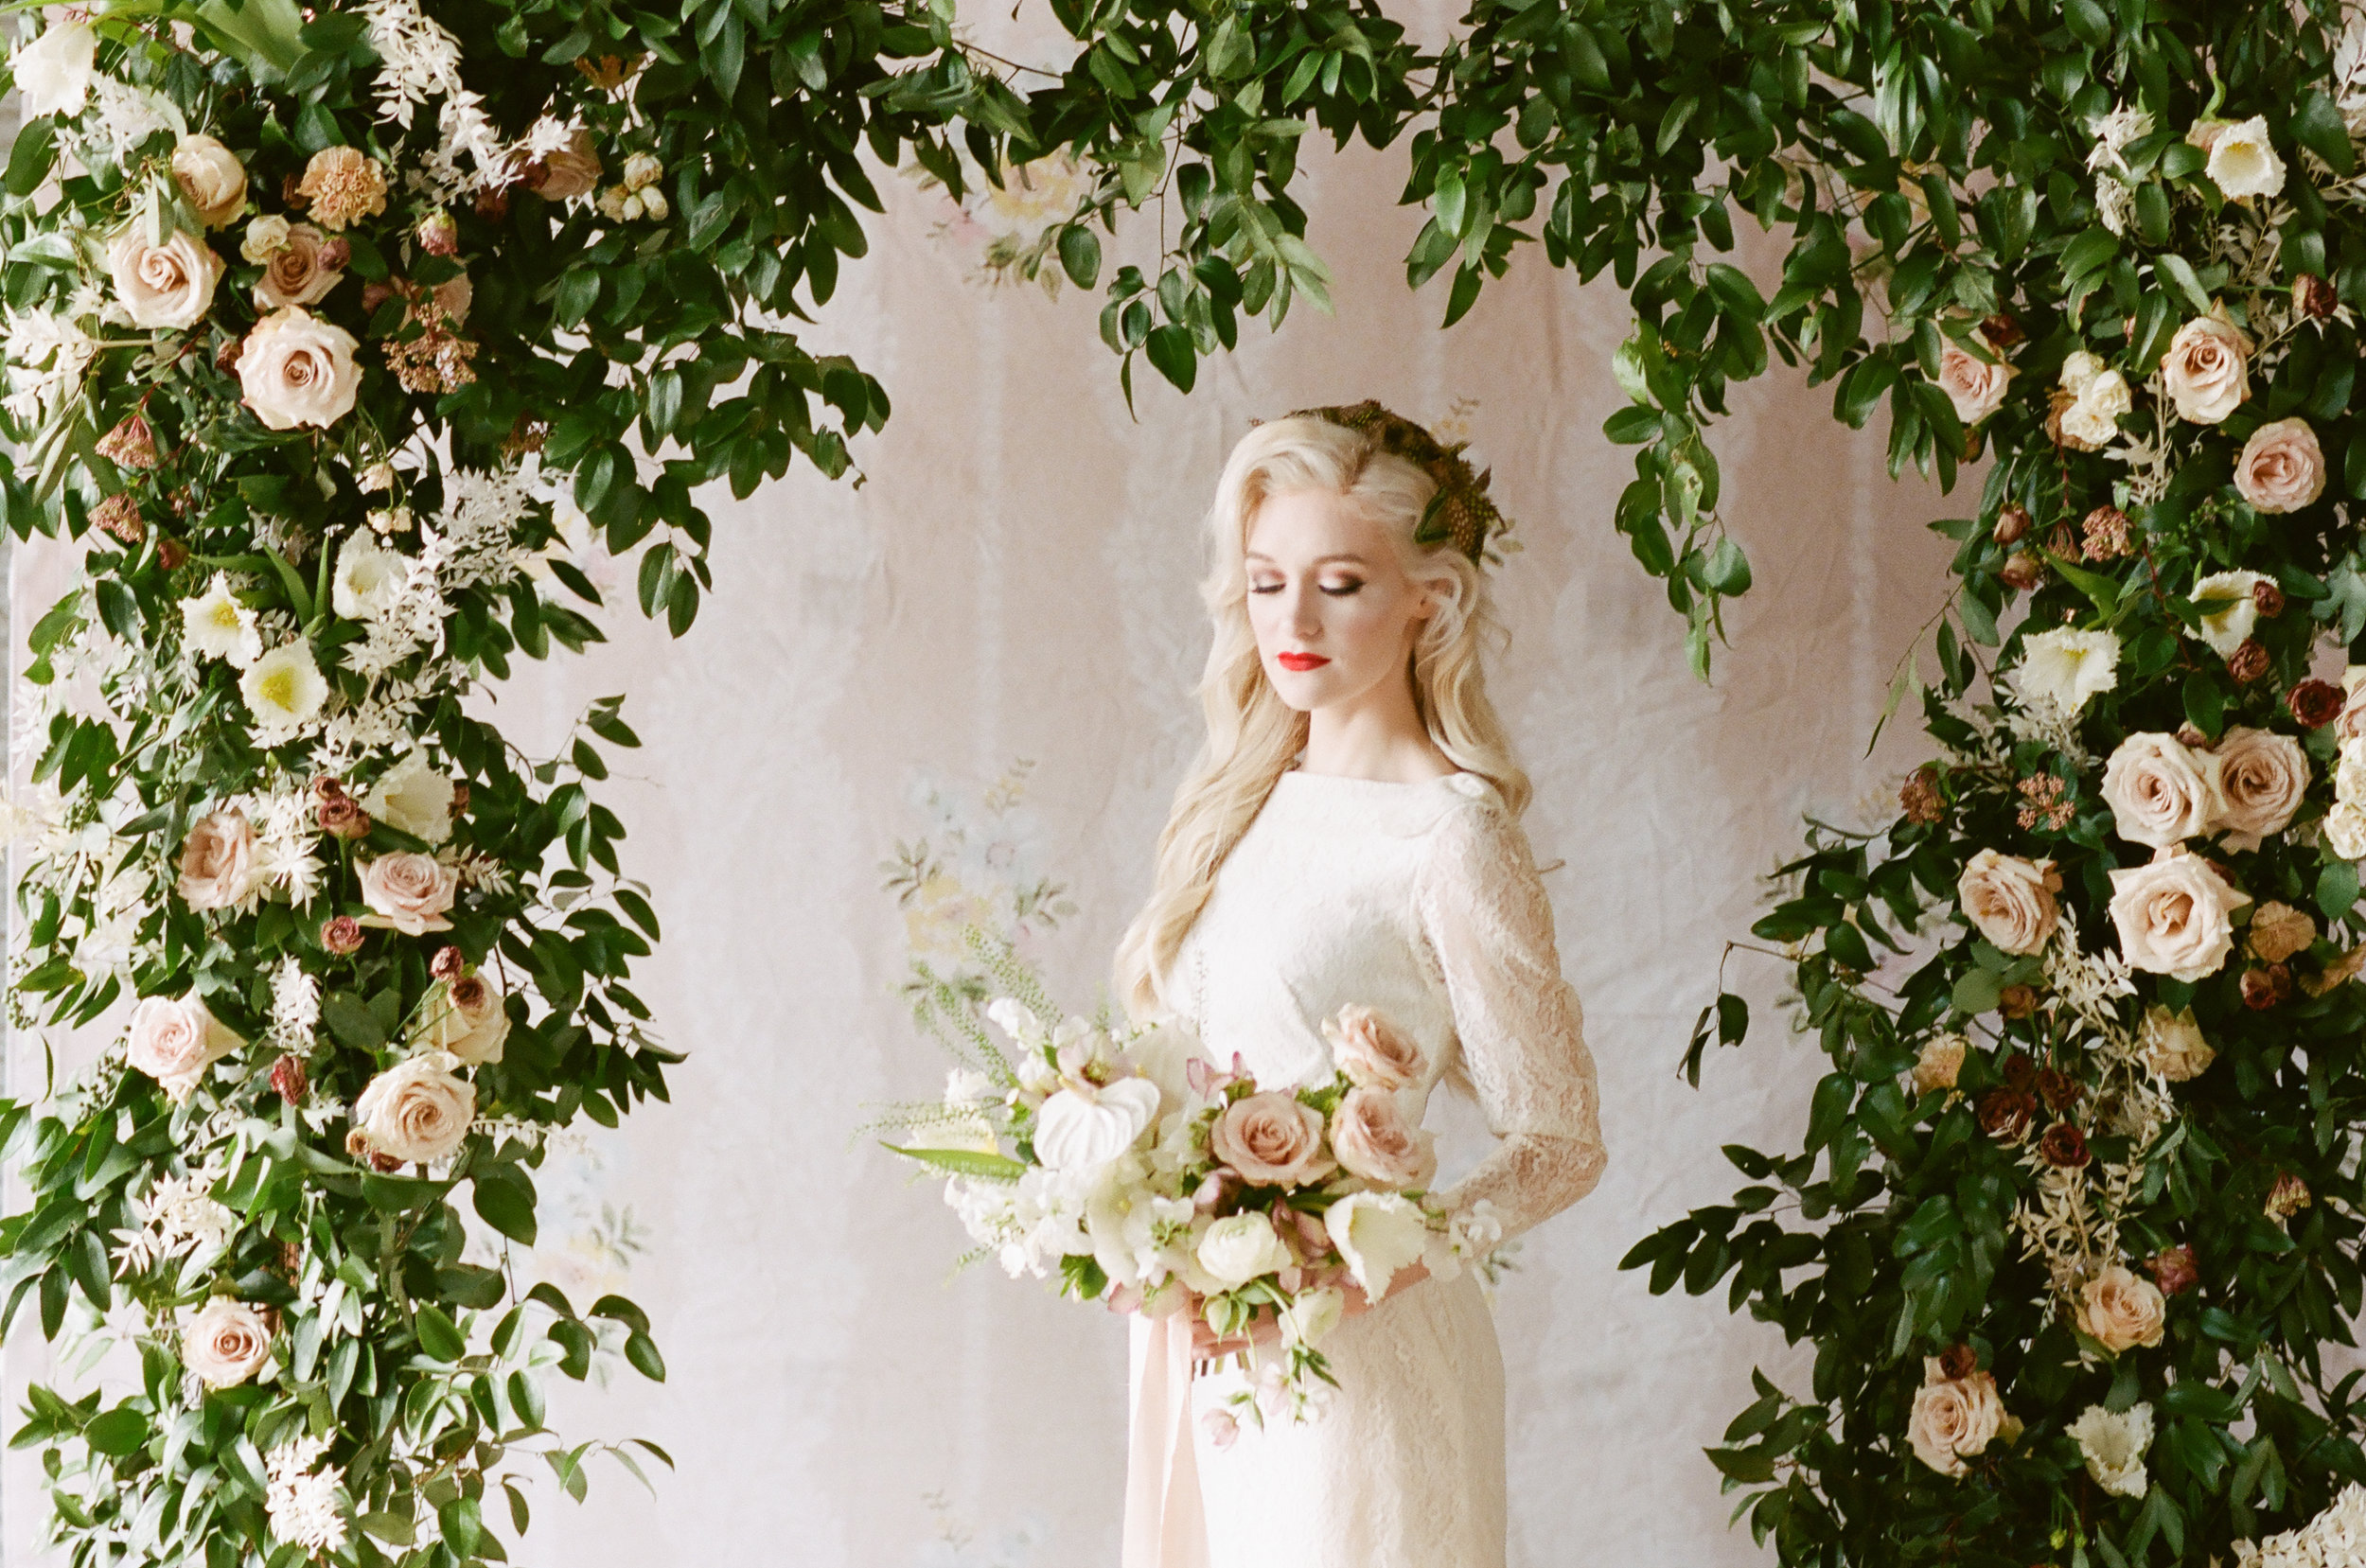 Next Gallery - Vintage Bridal Portraits - View Now